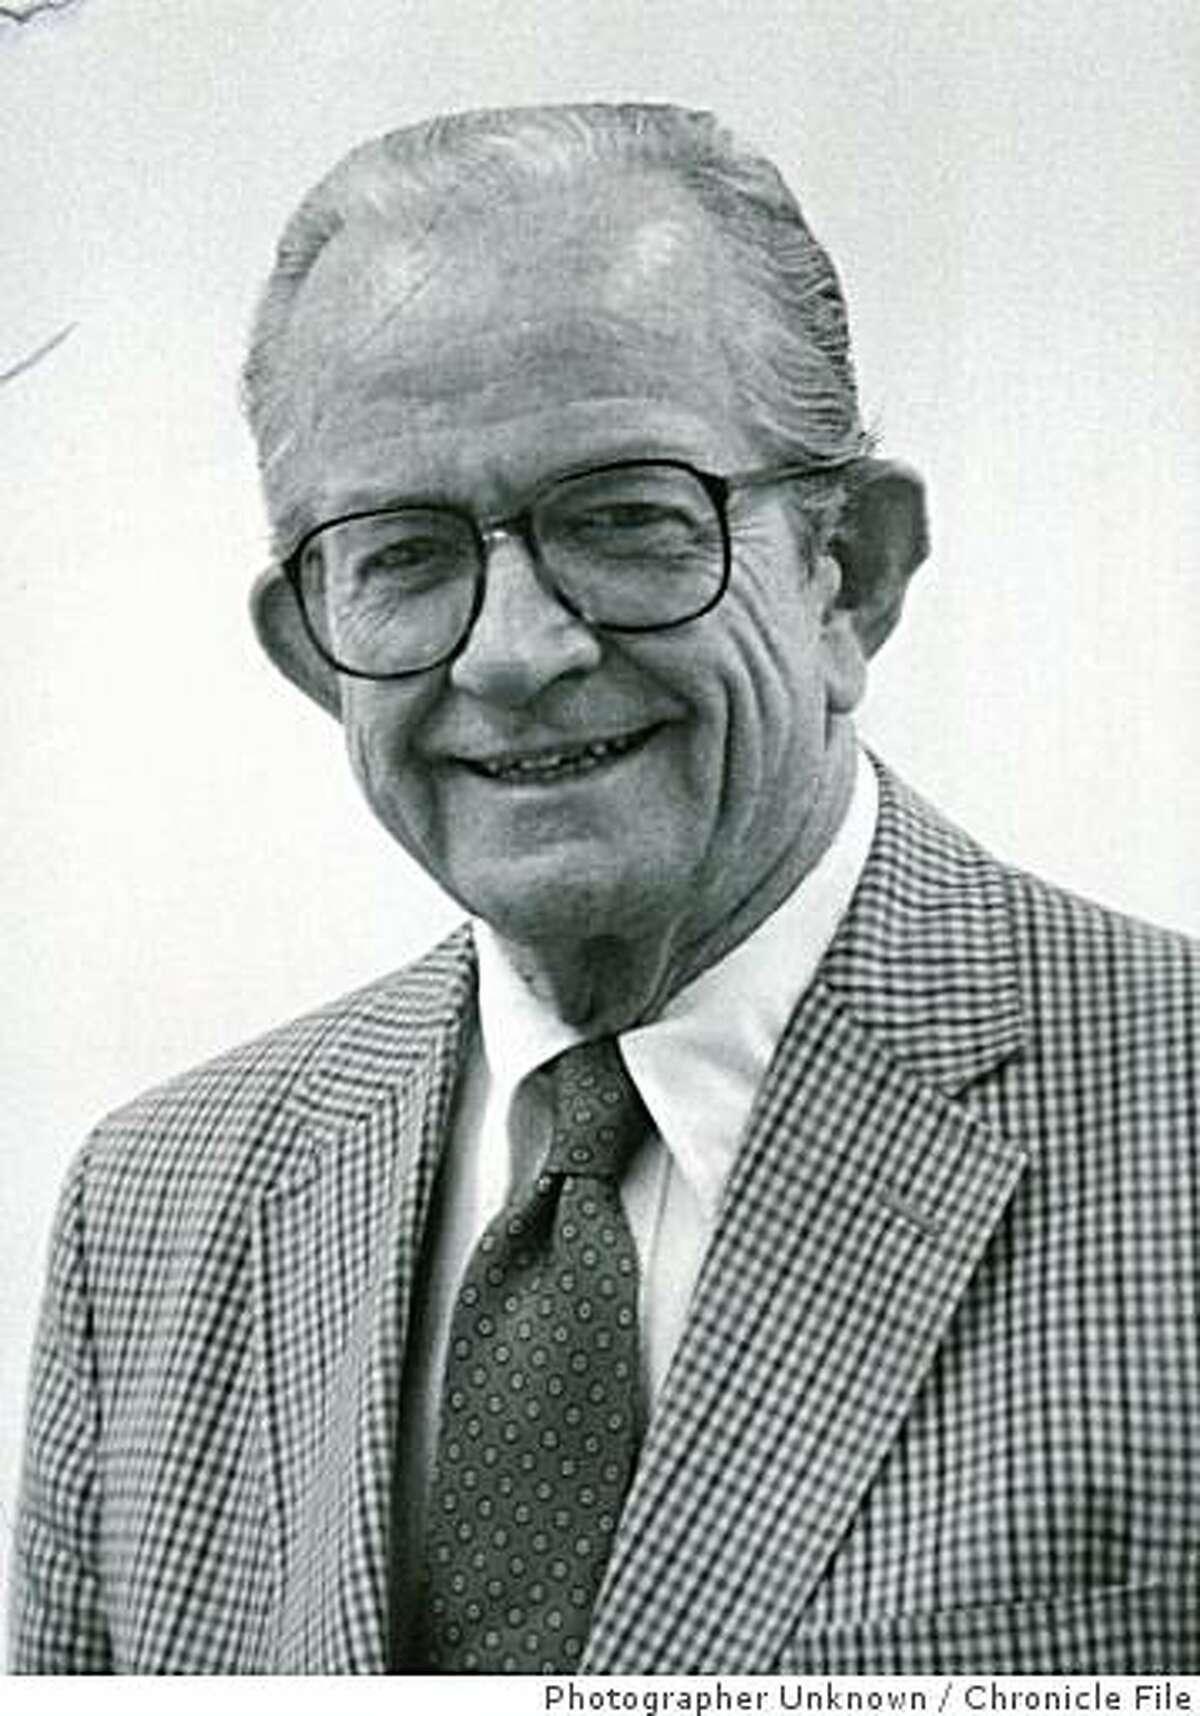 Osmundson.jpg Obit photo of landscape architect Ted Osmundson.Photographer Unknown Chronicle File